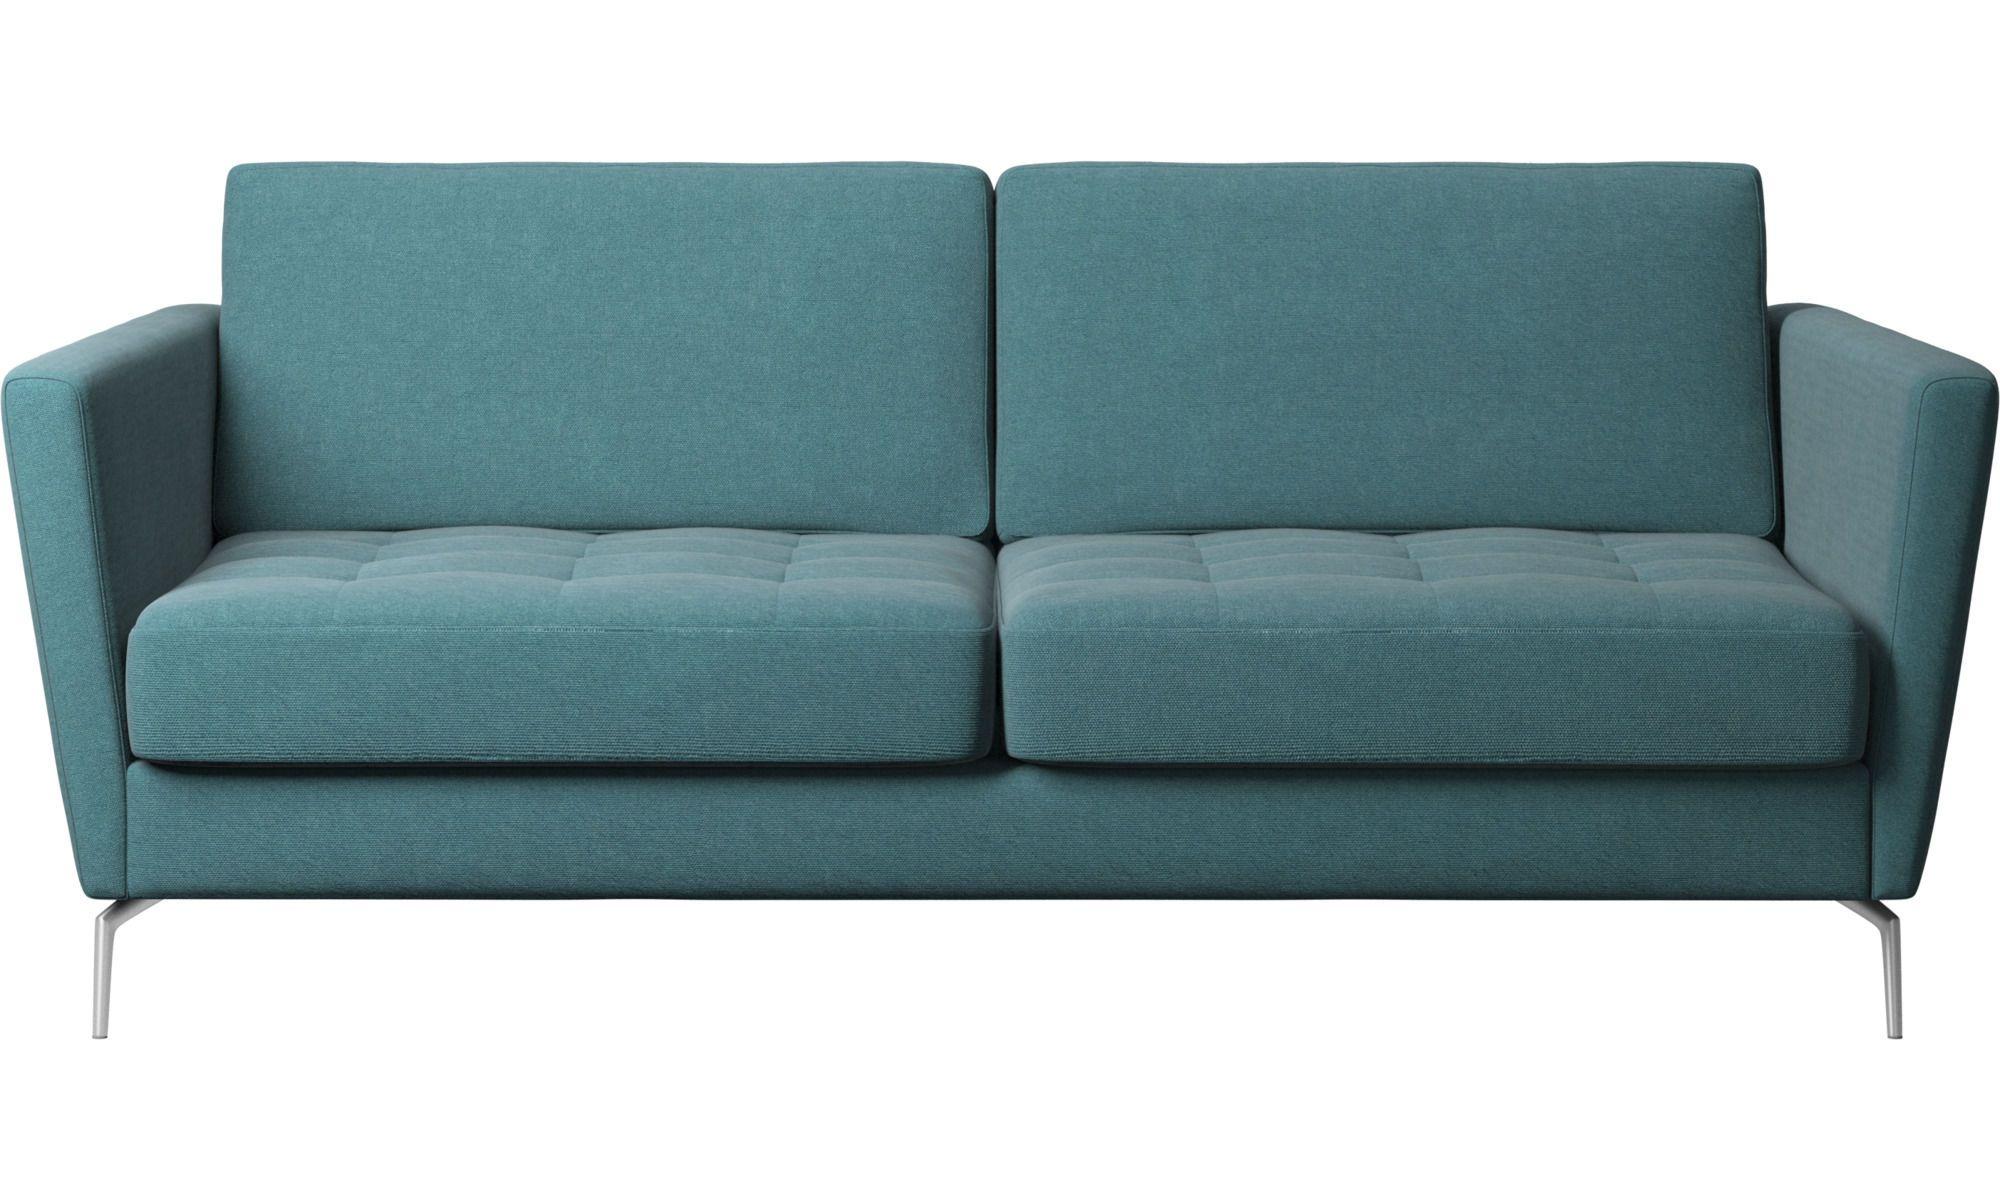 Sofa Beds Osaka Sofa Bed Tufted Seat Sofa Bed Sofa Bed Blue Modular Sofa Design